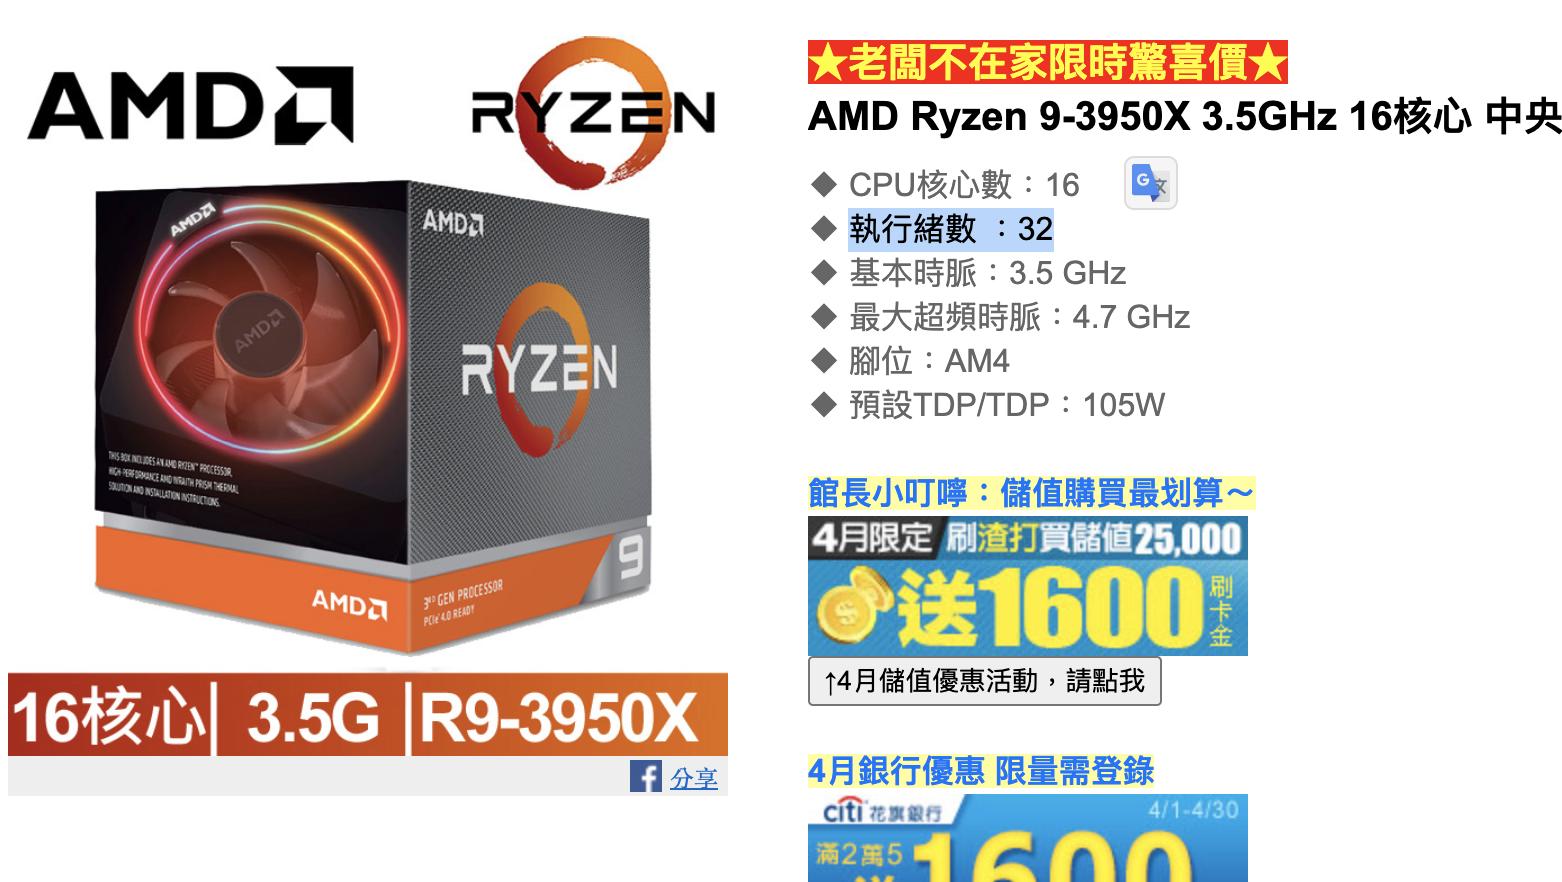 AMD Ryzen 9-3950X